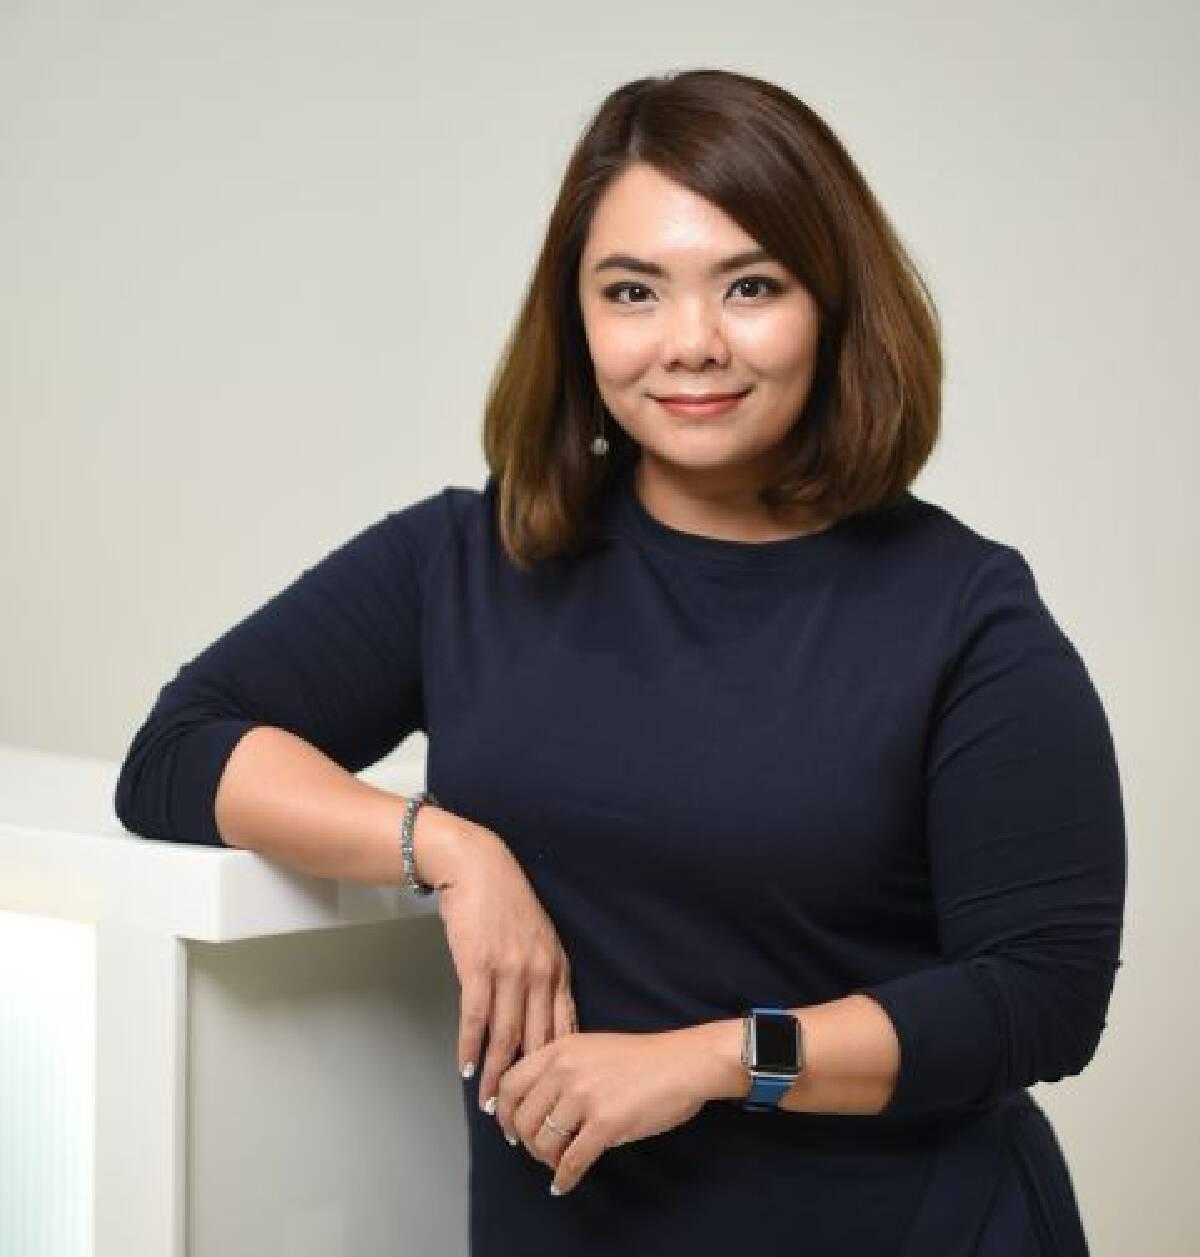 GROWTH ai สตาร์ทอัพไทยหนึ่งเดียวเข้าร่วม Facebook Accelerator